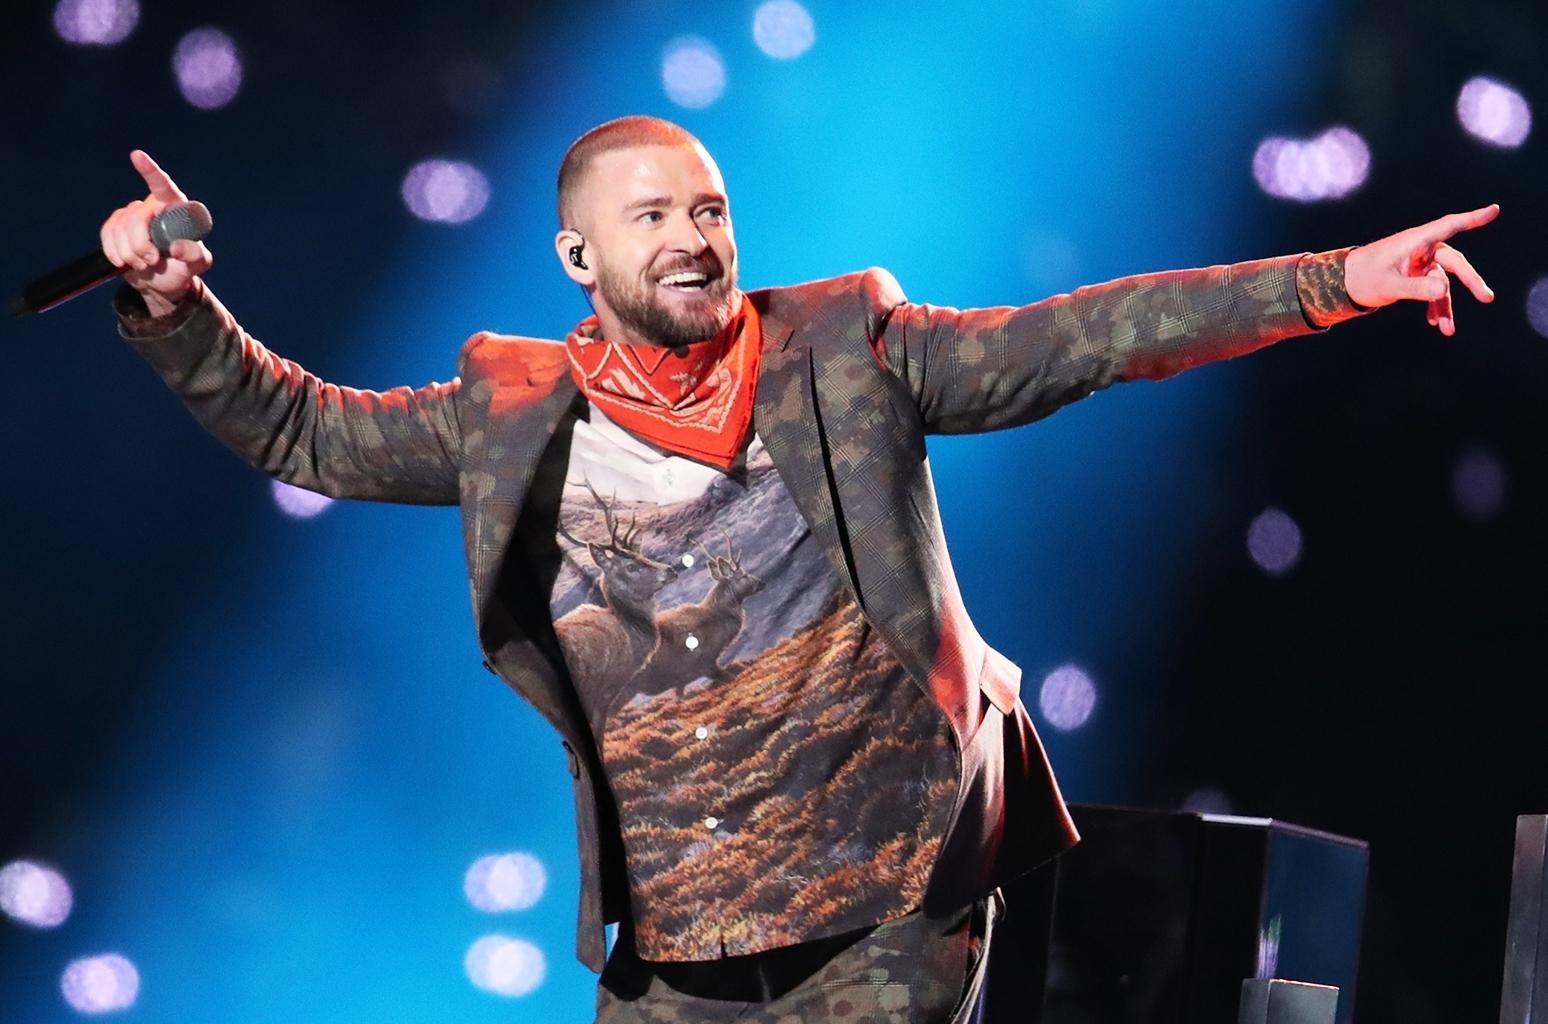 Justin Timberlake's Super Bowl Halftime Show: 5 Takeaways with regard to Justin Timberlake Super Bowl 2018